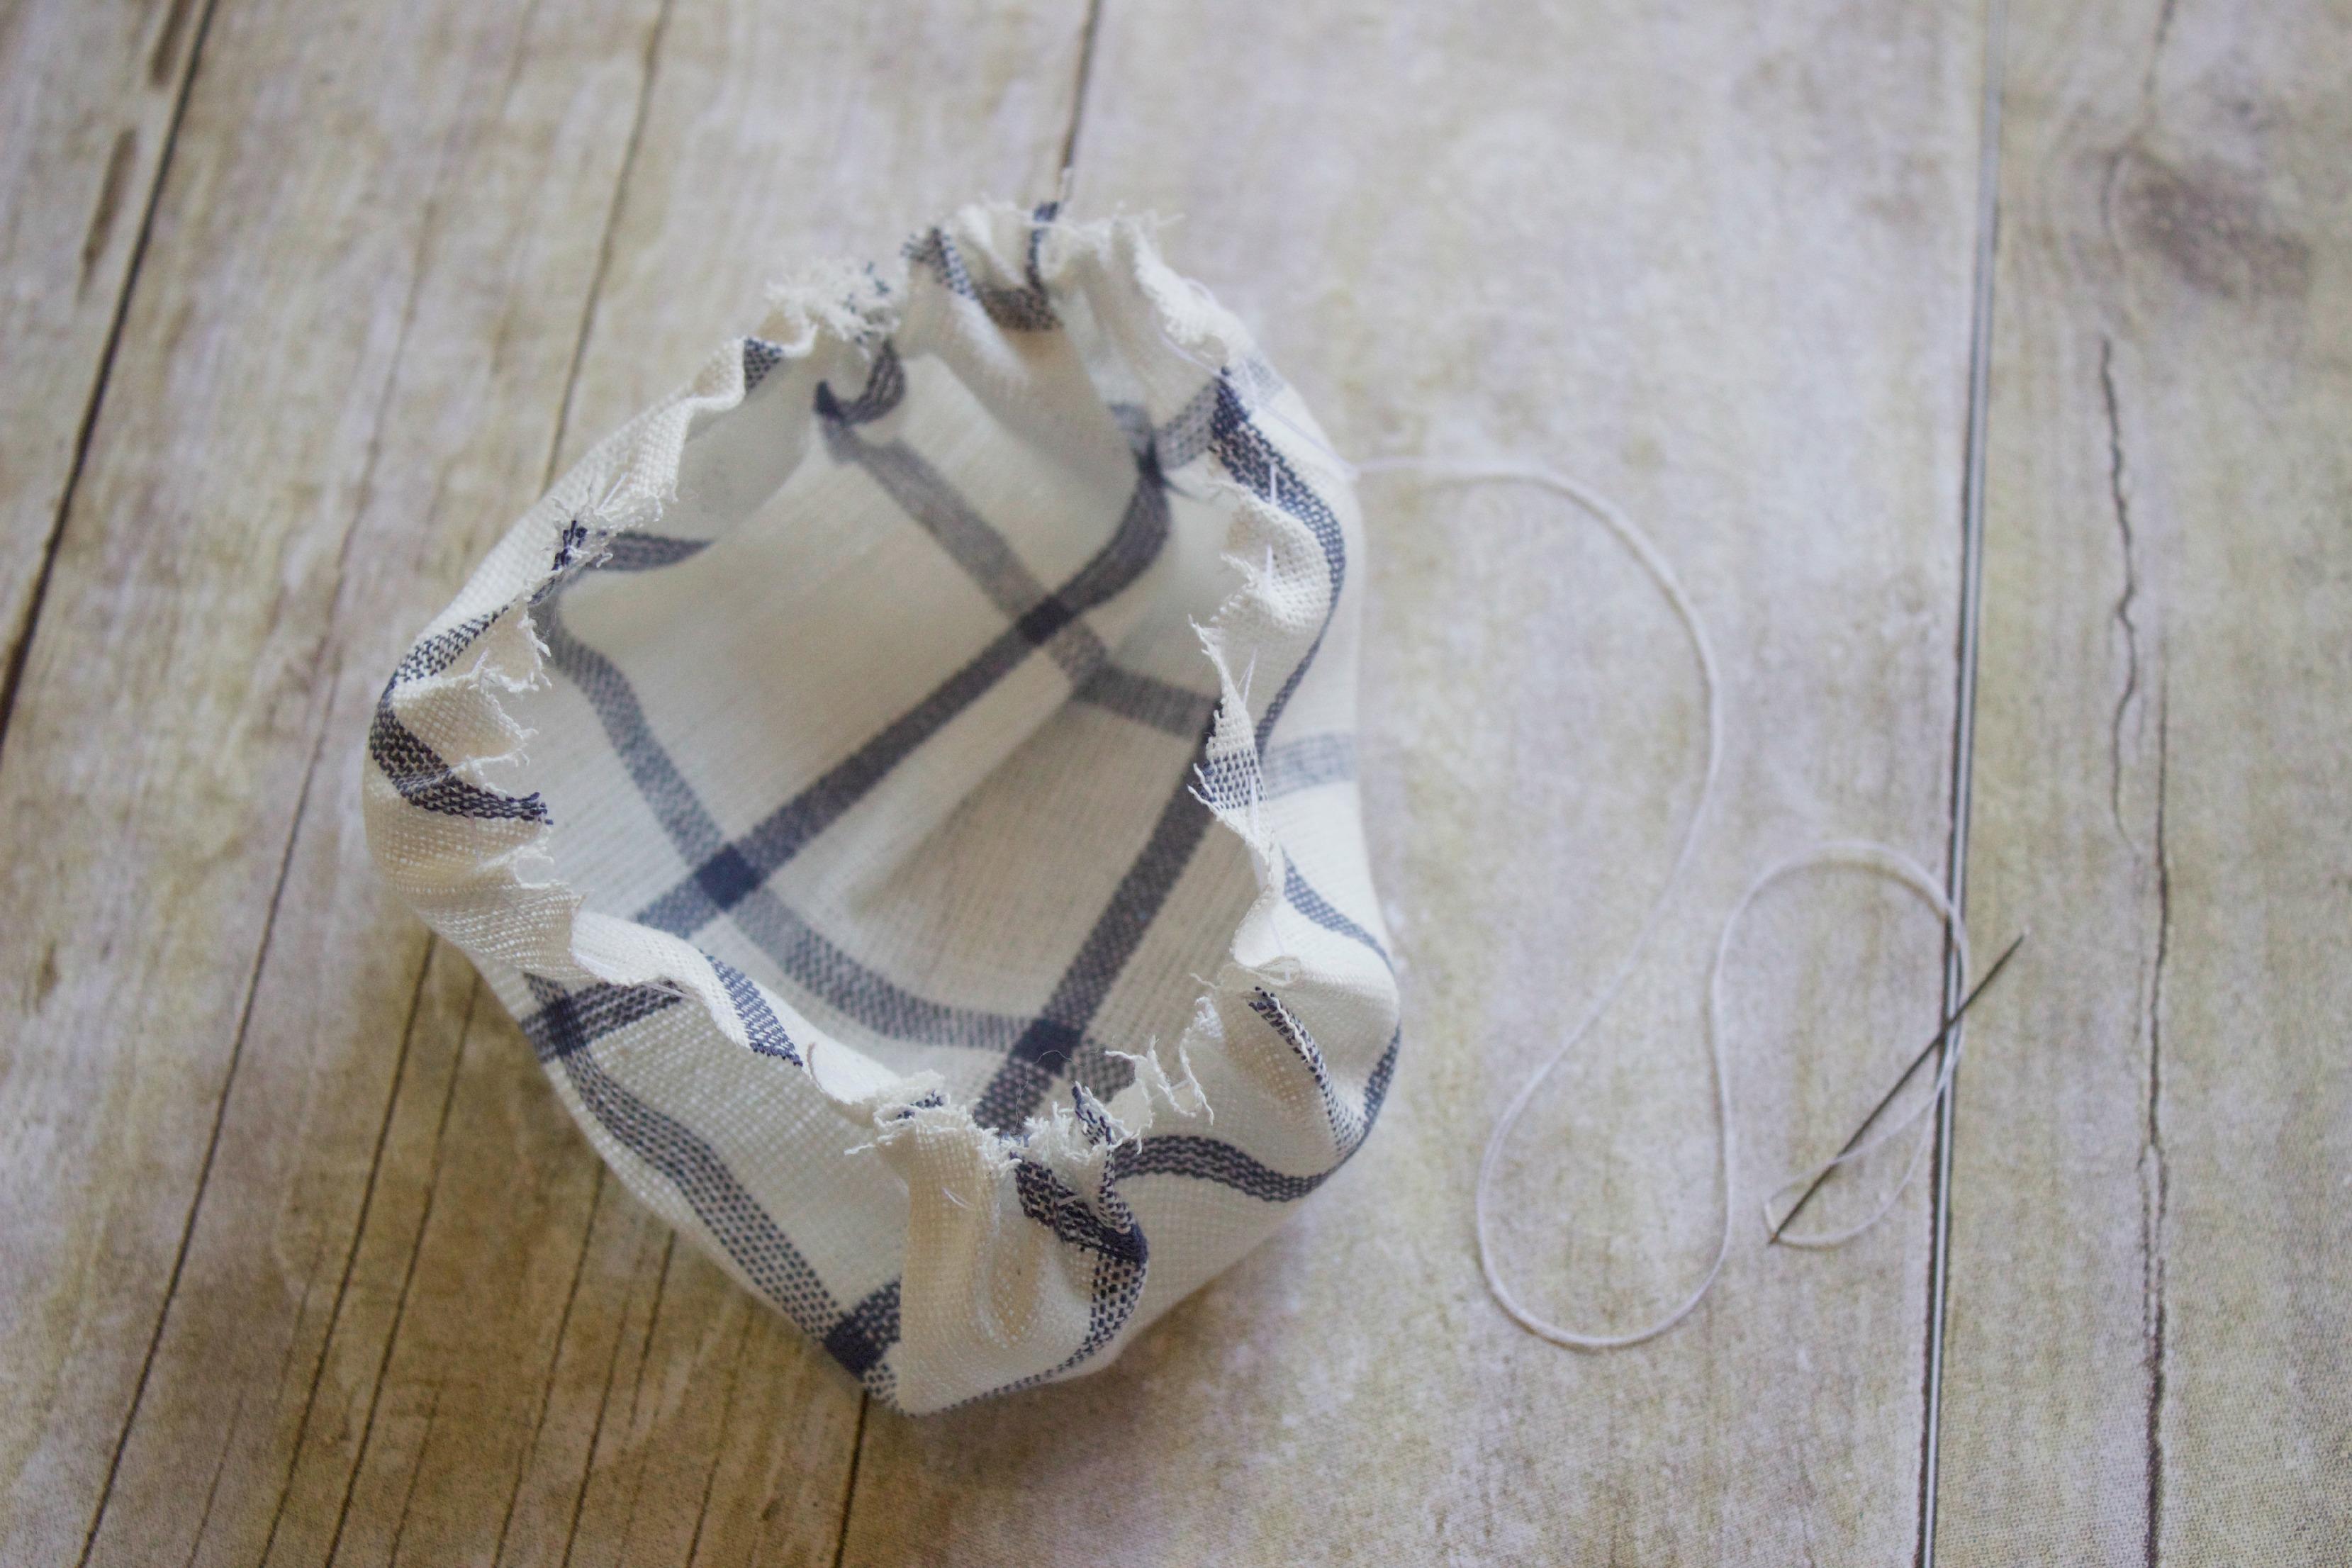 How to Make a Pin Cushion  | The Everyday Home |  www.everydayhomeblog.com